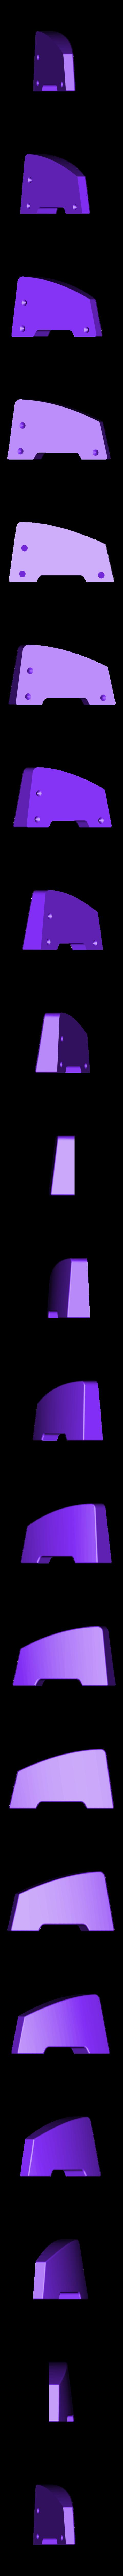 Printer_Side_L.STL Download free STL file Table Organizer - Hand Printer • 3D print design, KuKu